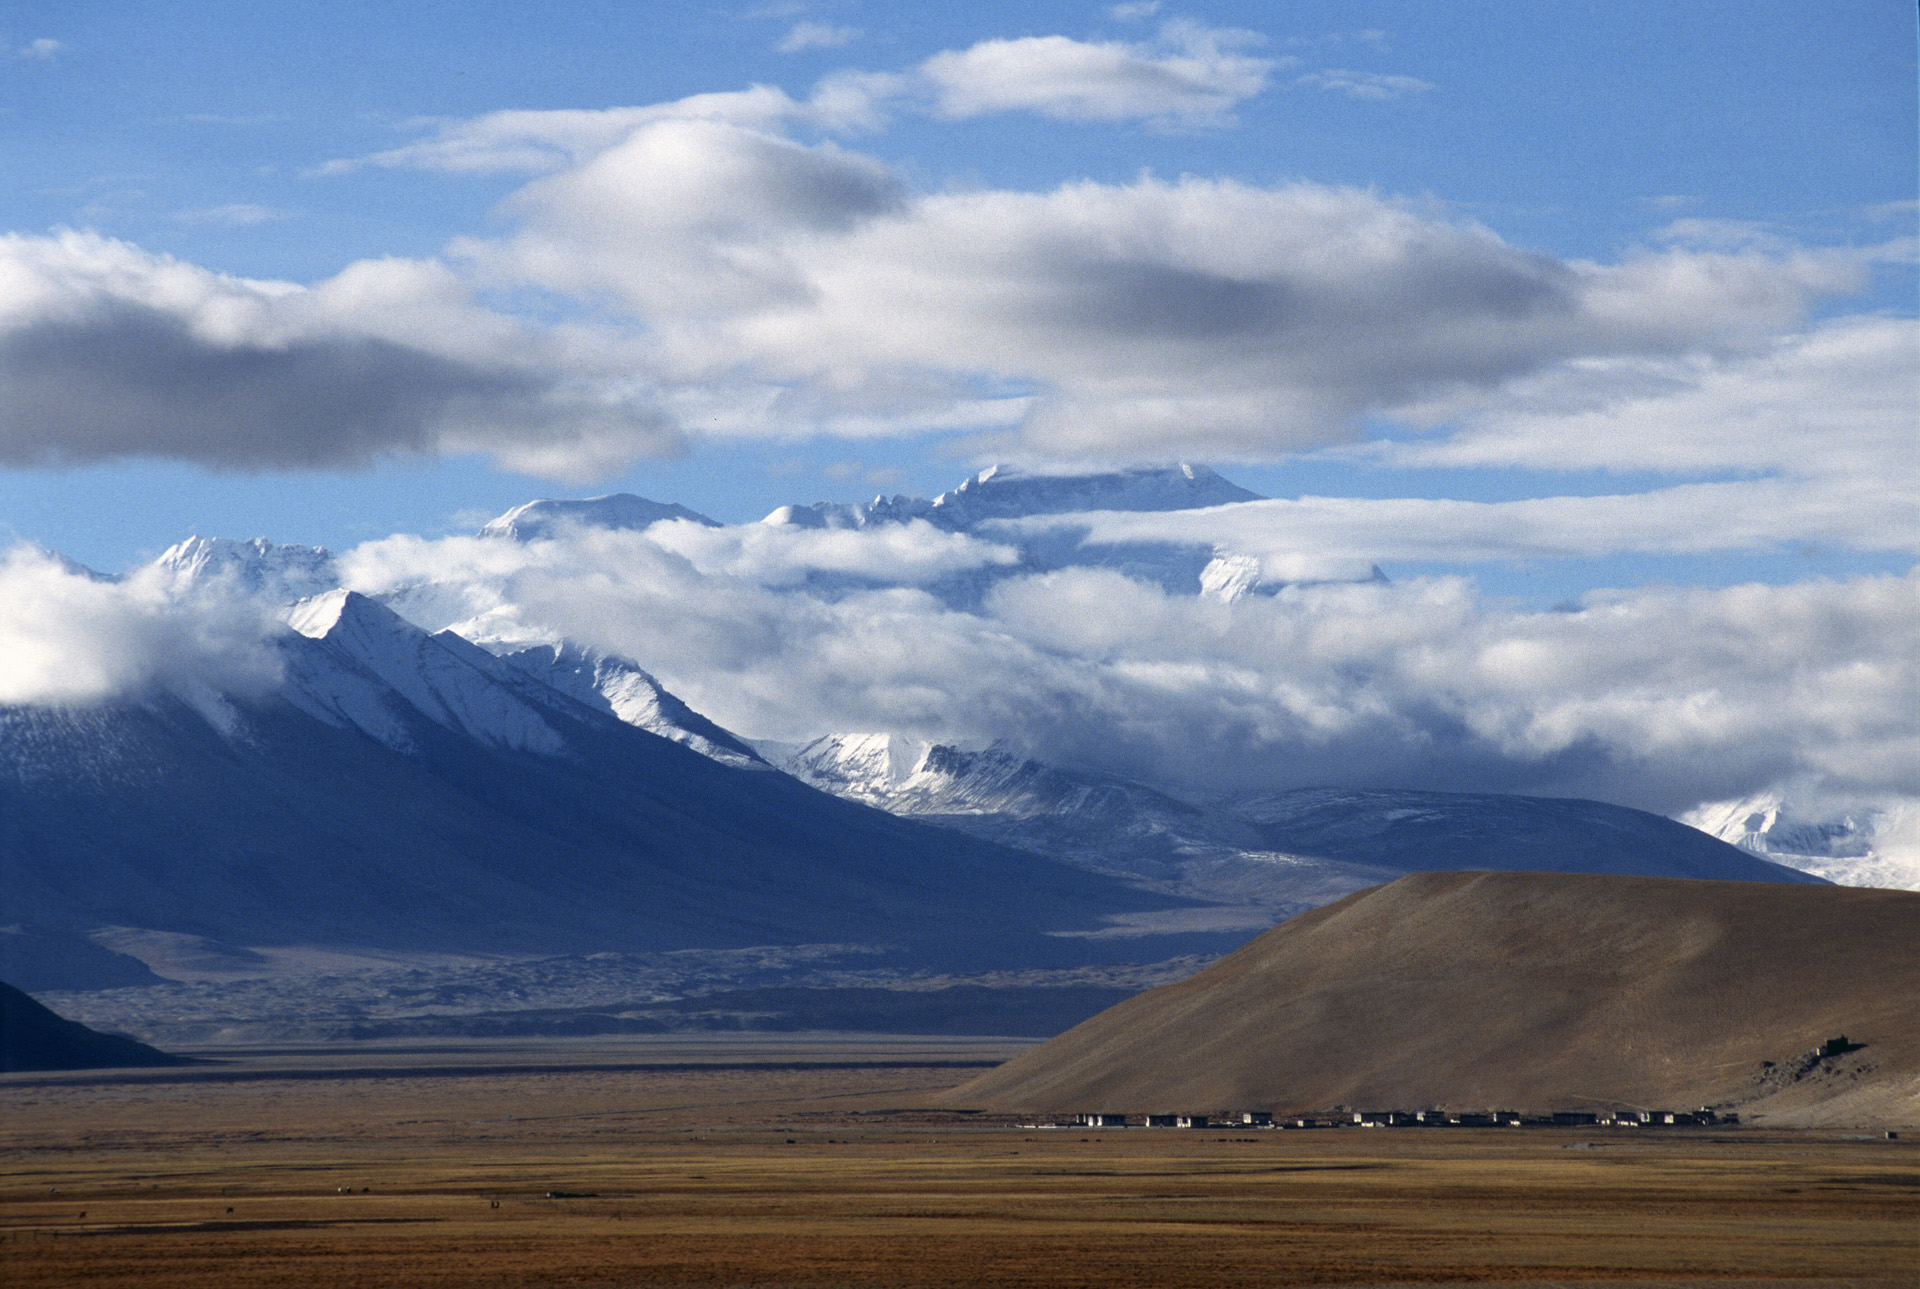 Mt. Everest from Tibet